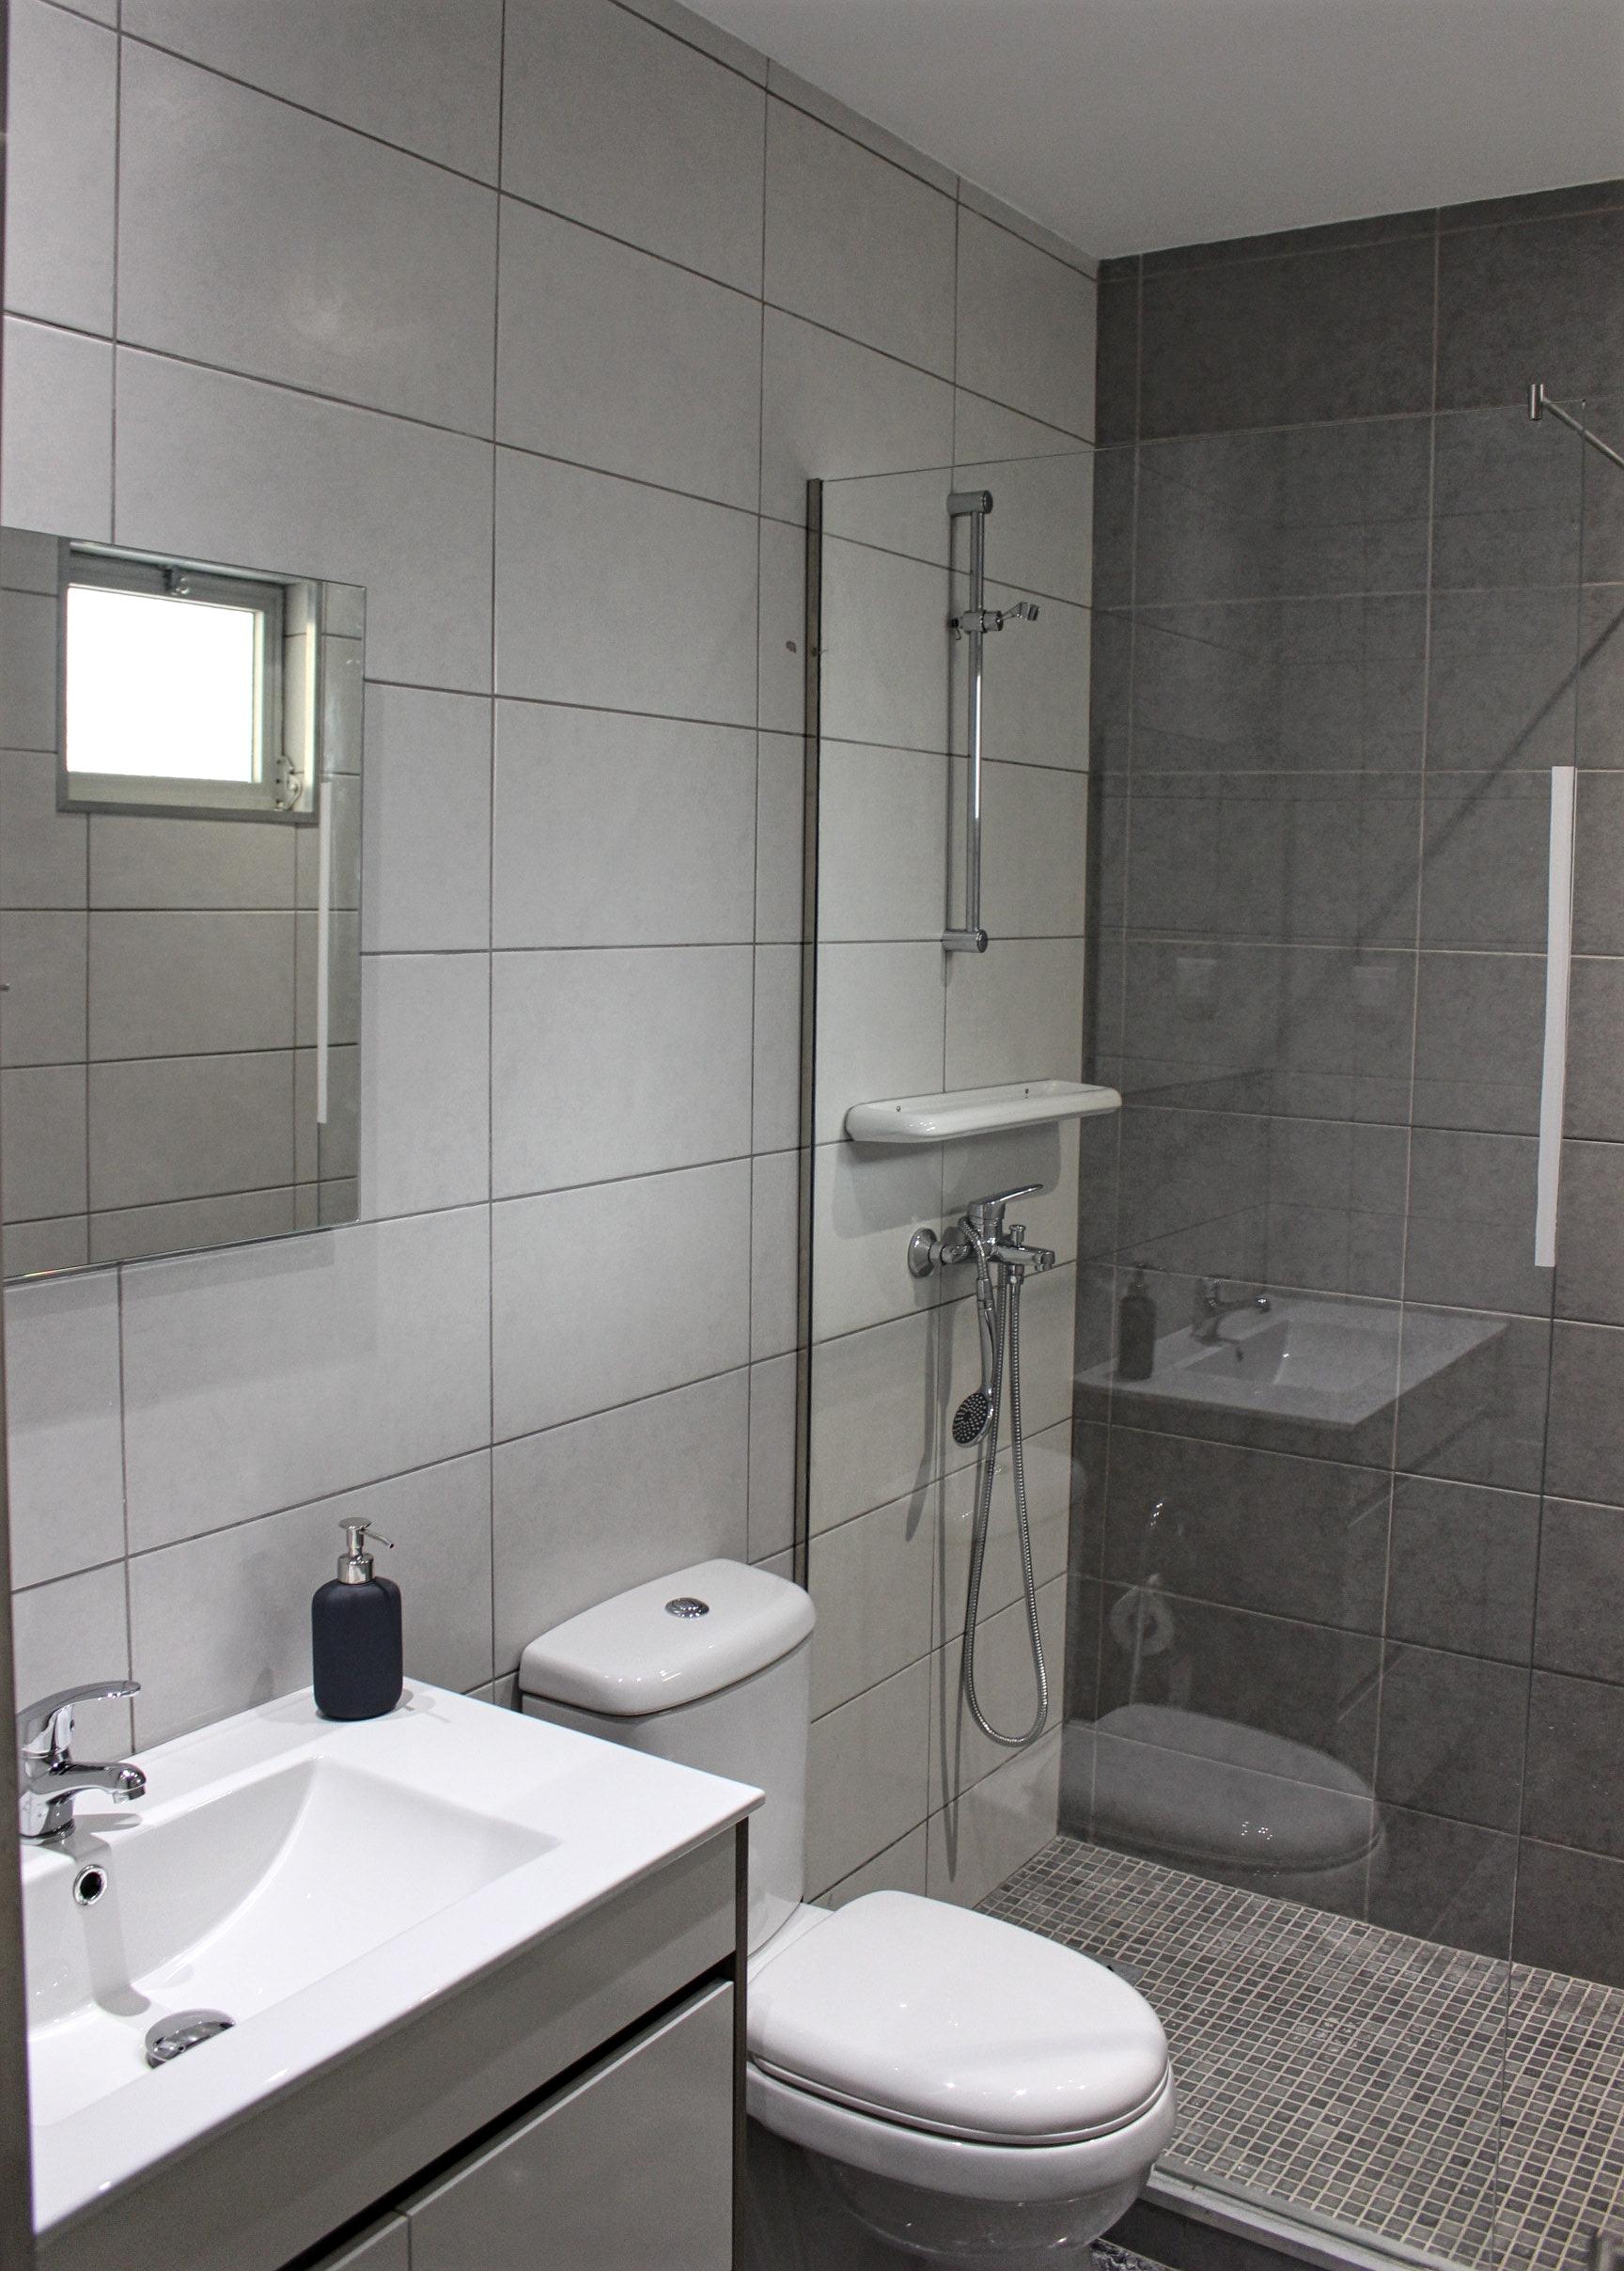 Location appartements et villas de vacance, Moradia T2 no Centro de Albufeira (Algarve) à Albufeira, Portugal Algarve, REF_IMG_3078_3086